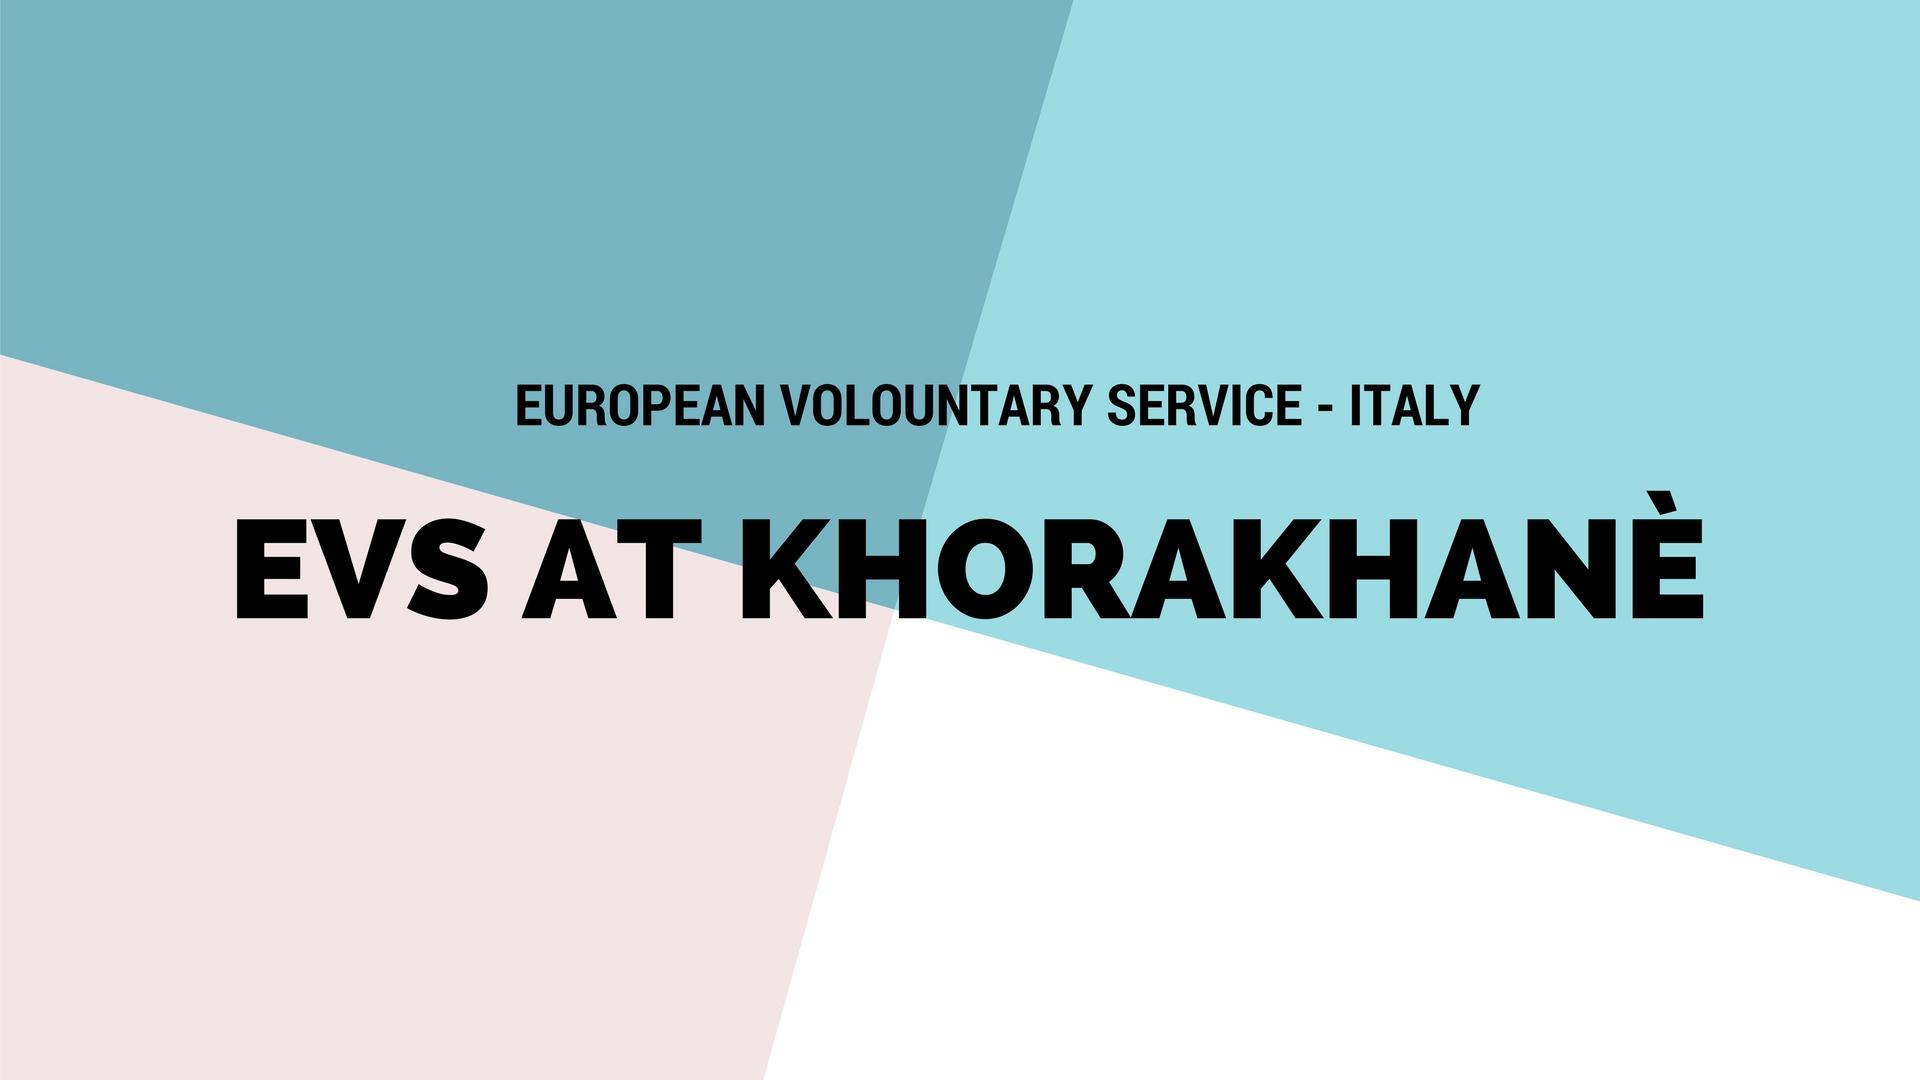 EVS PROJECT KHORAKHANÈ